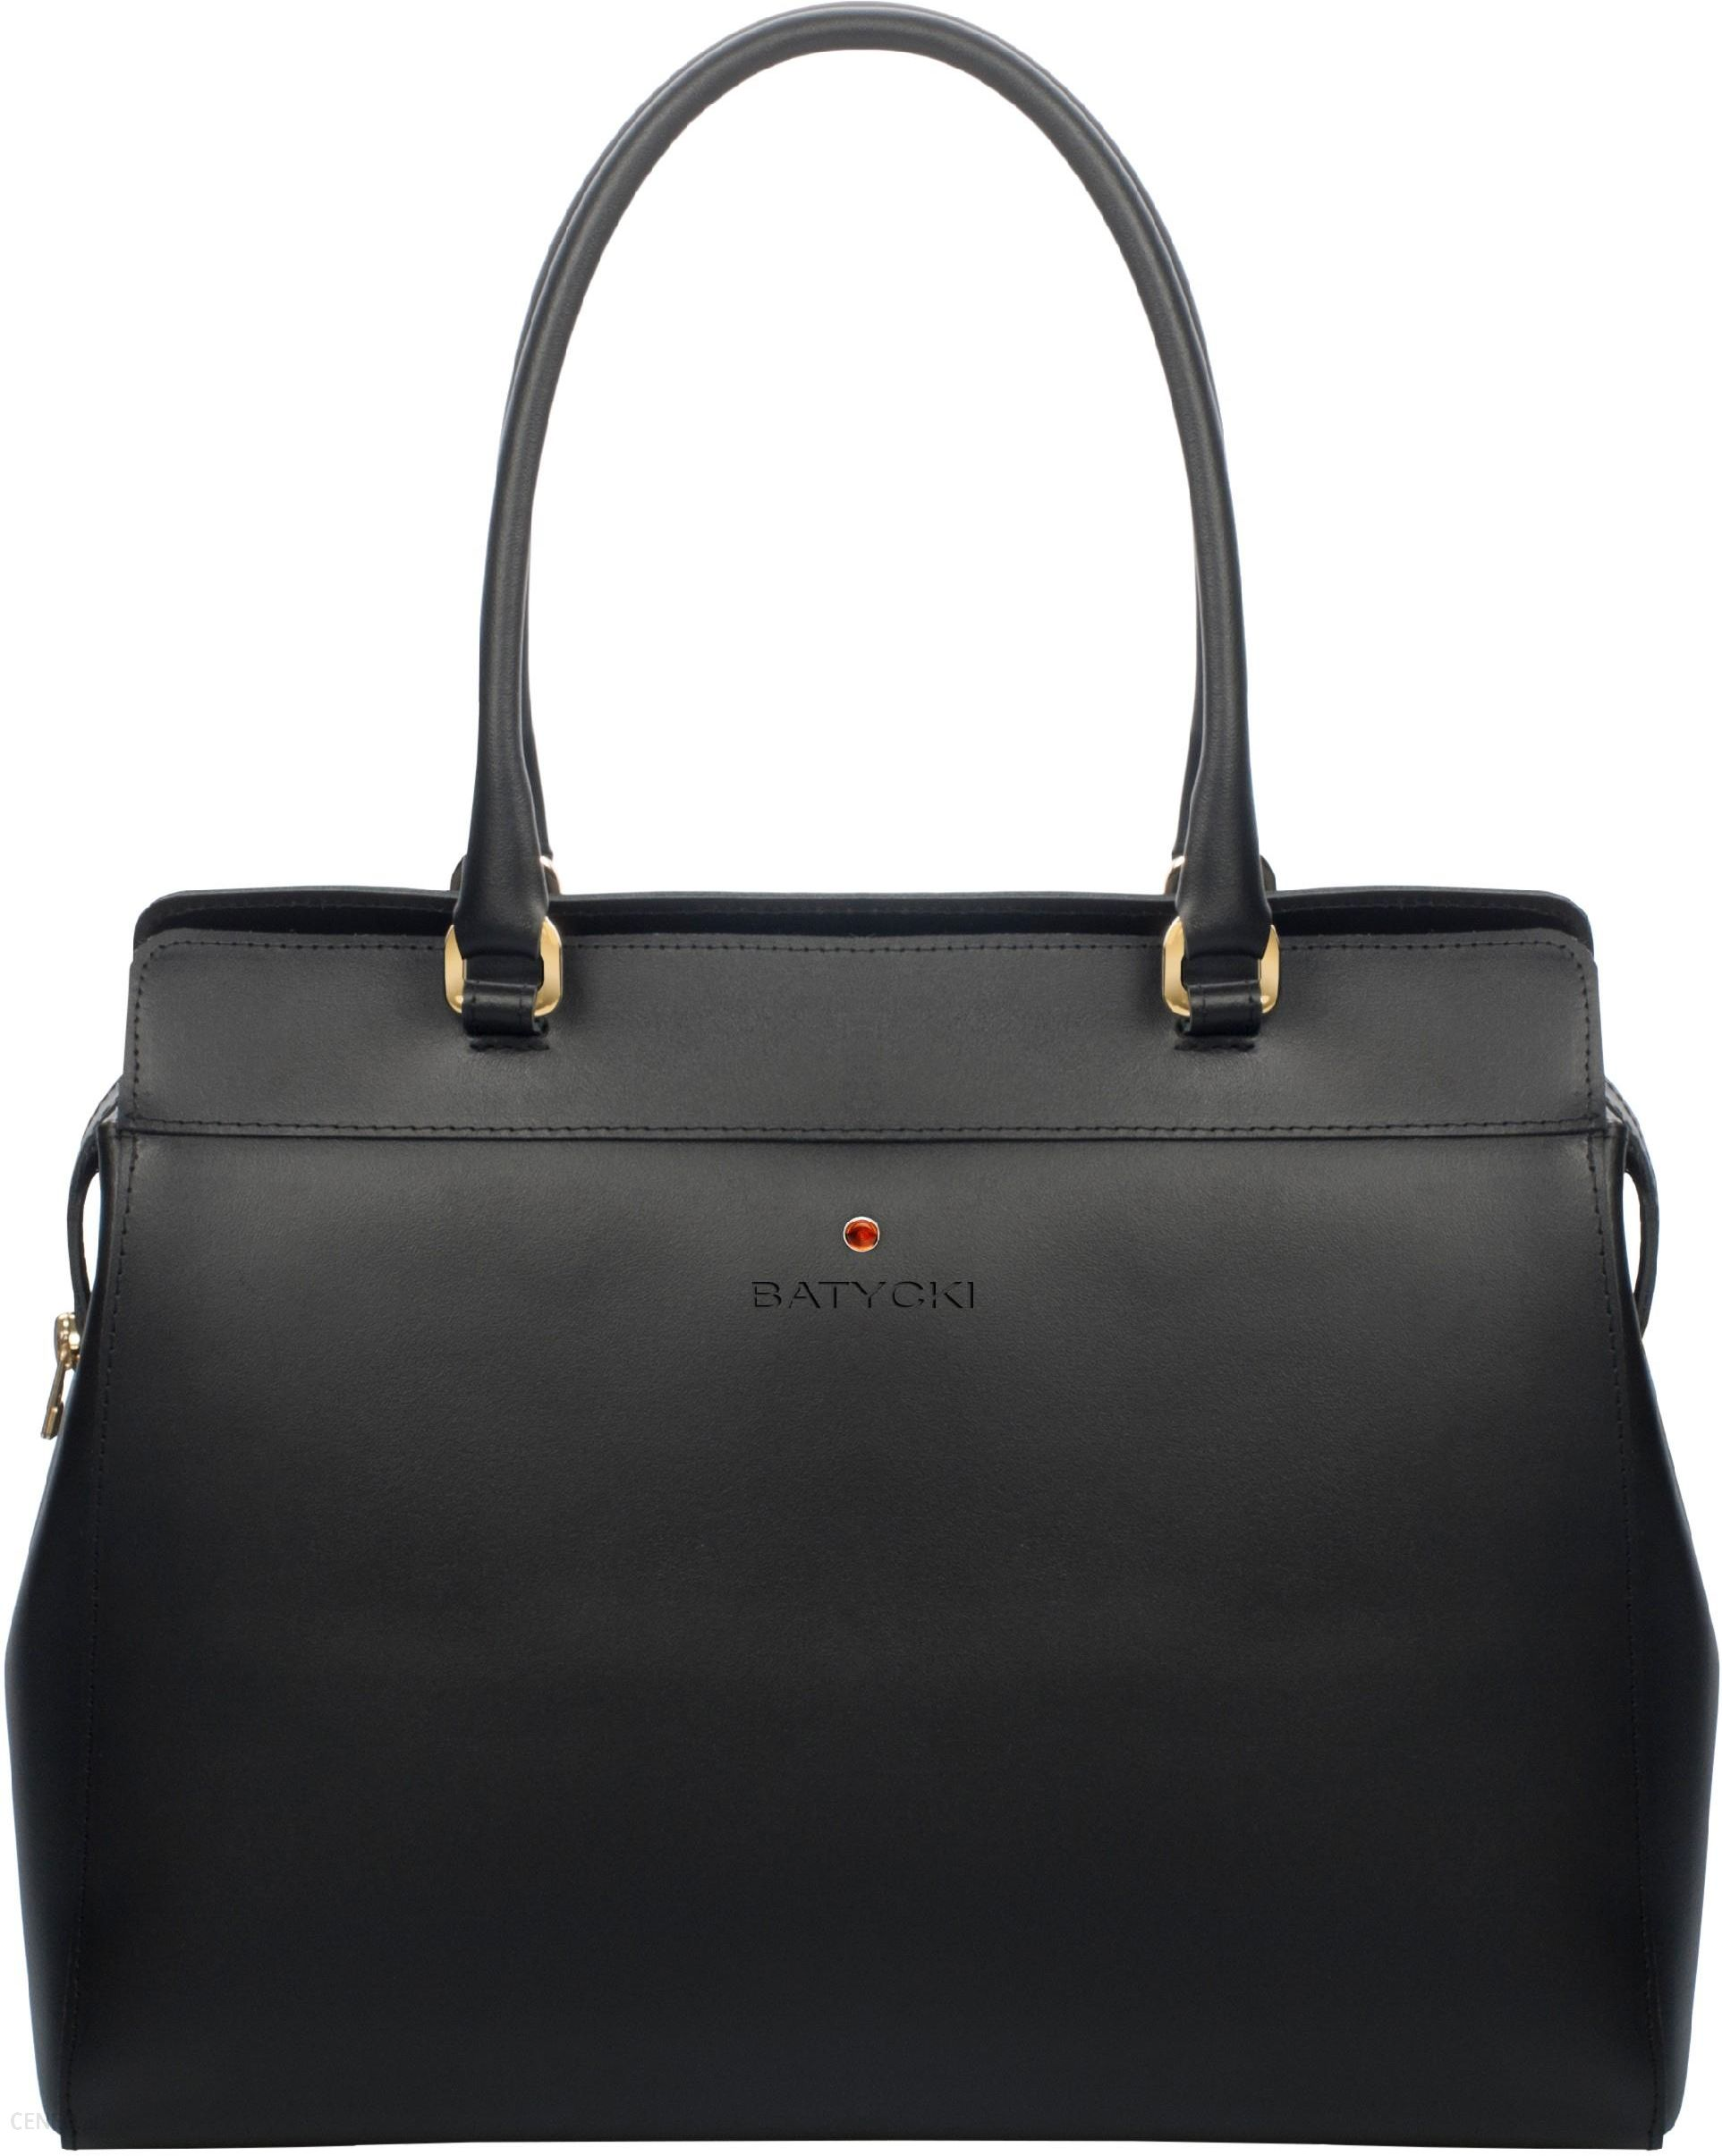 479f980f2c417 Torebka damska skórzana kuferek Batycki Smart Bag - Ceny i opinie ...